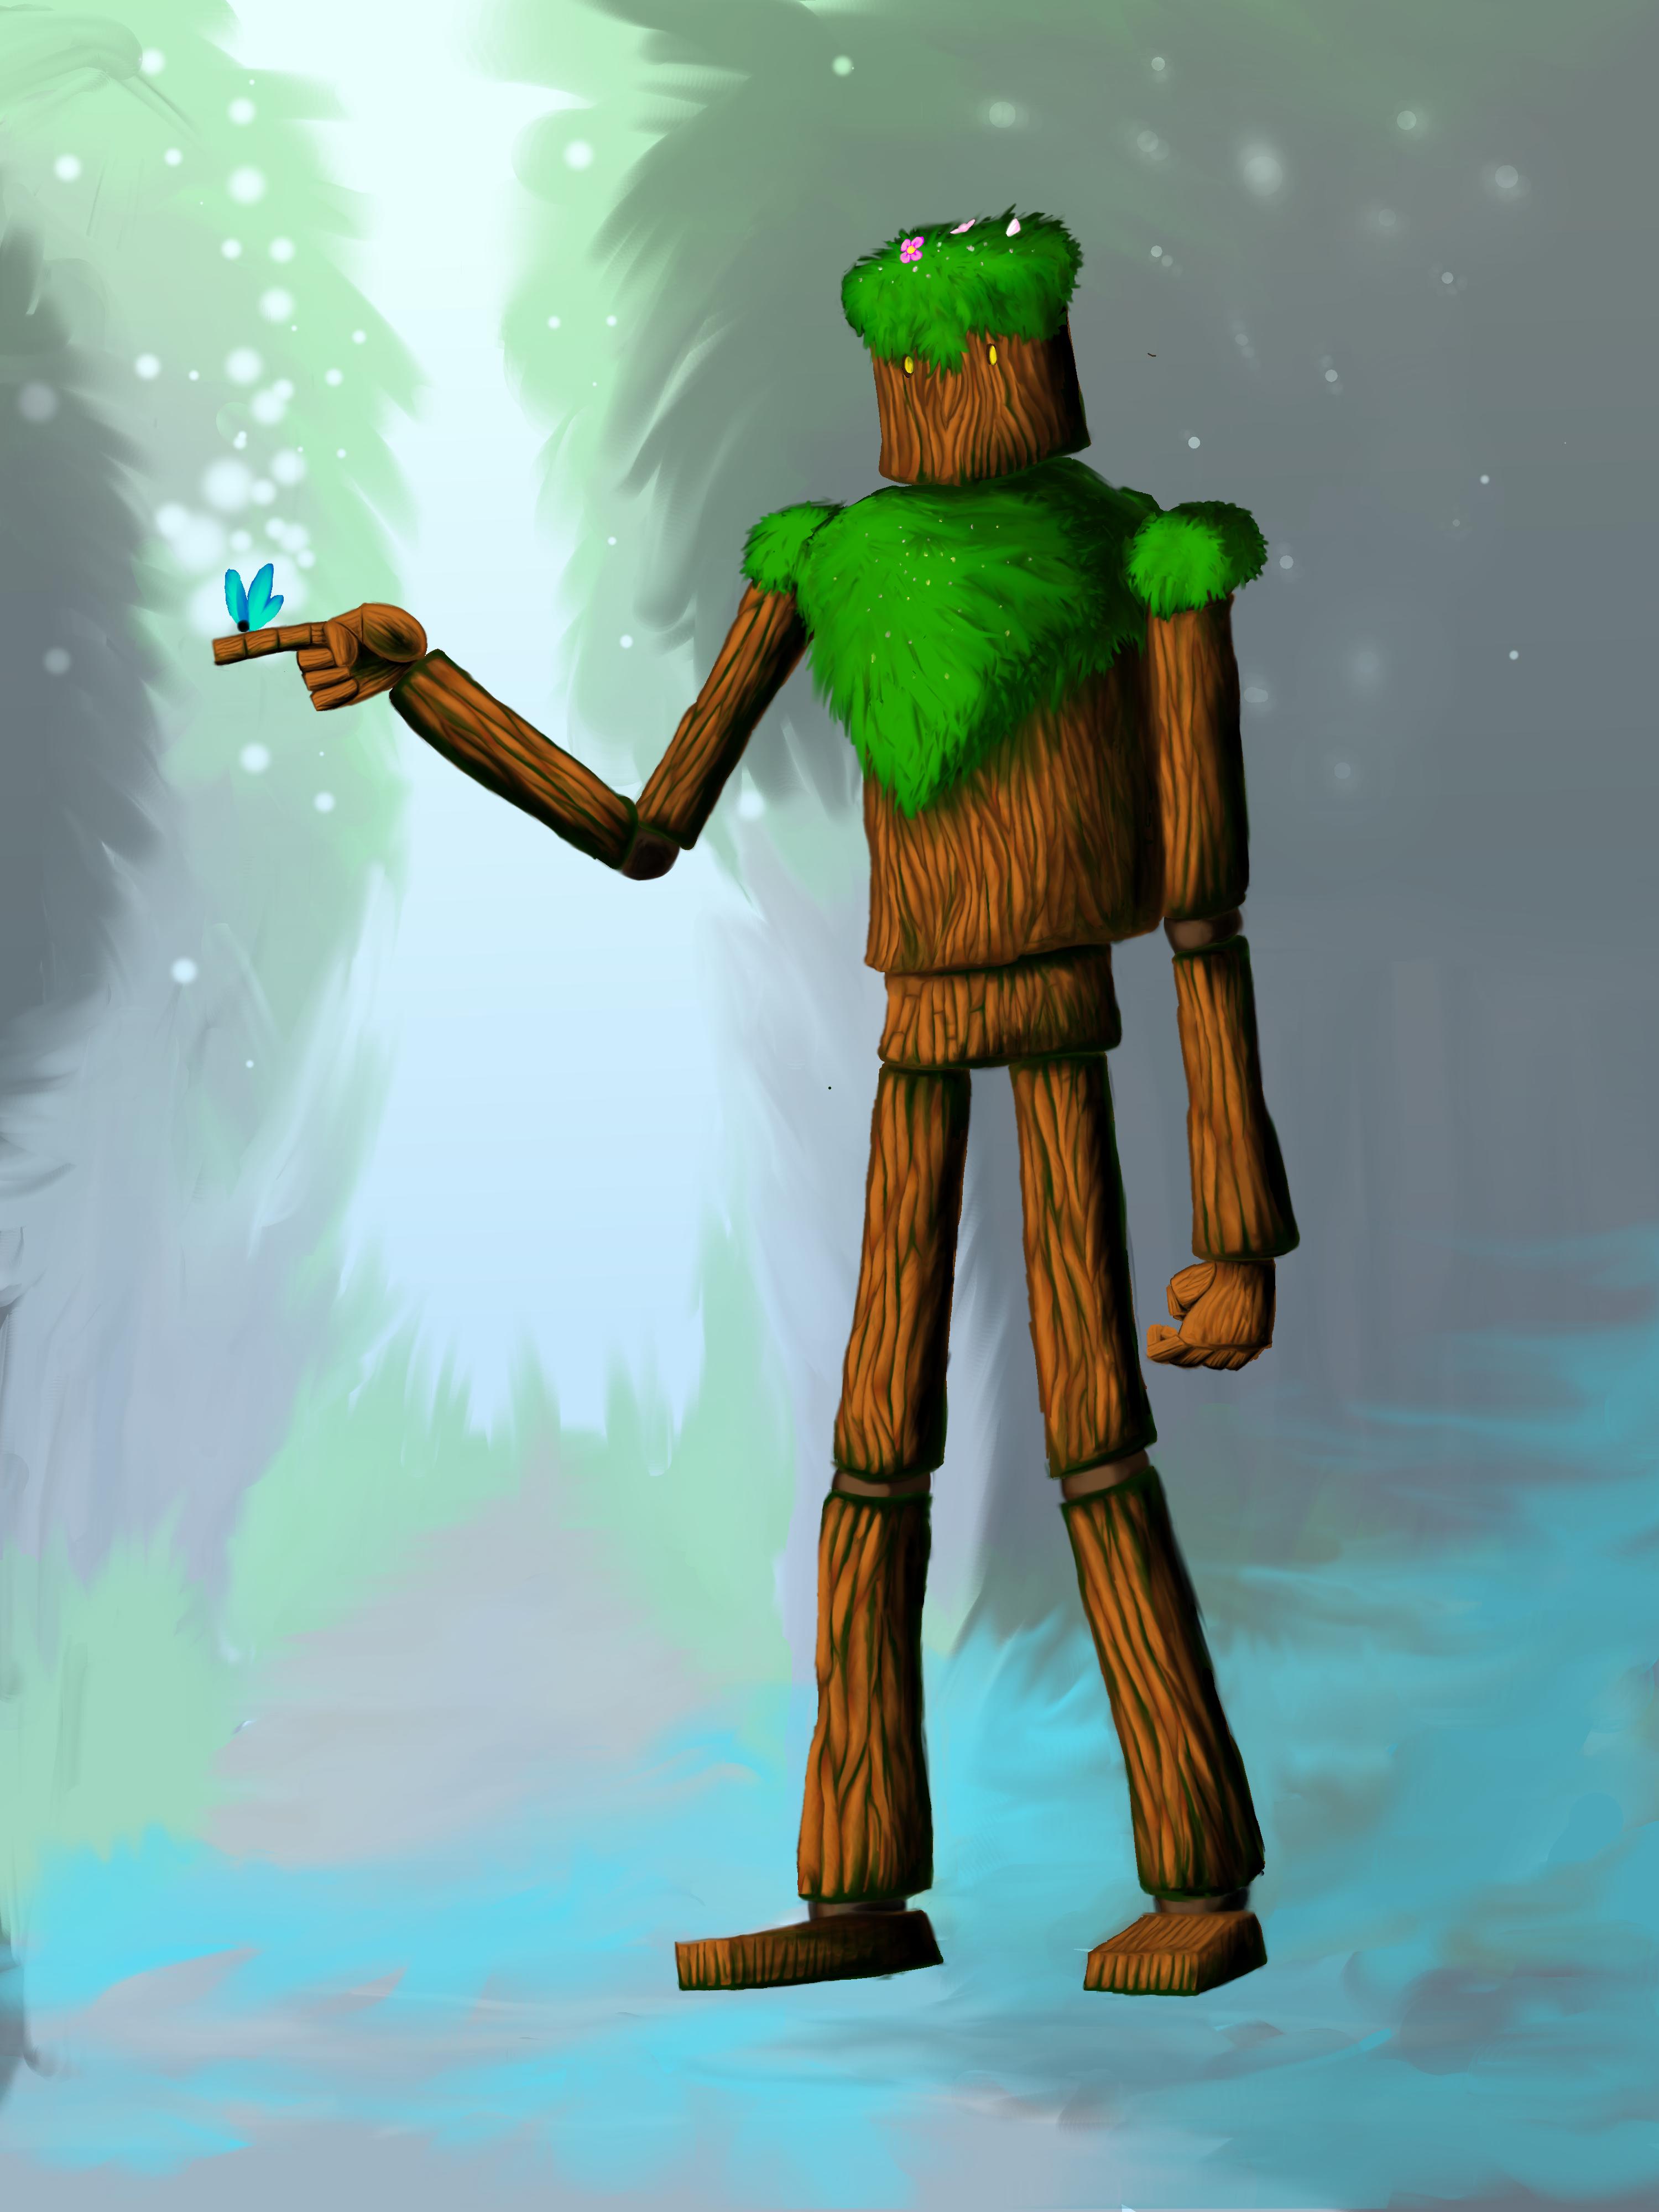 Wooden Guardian